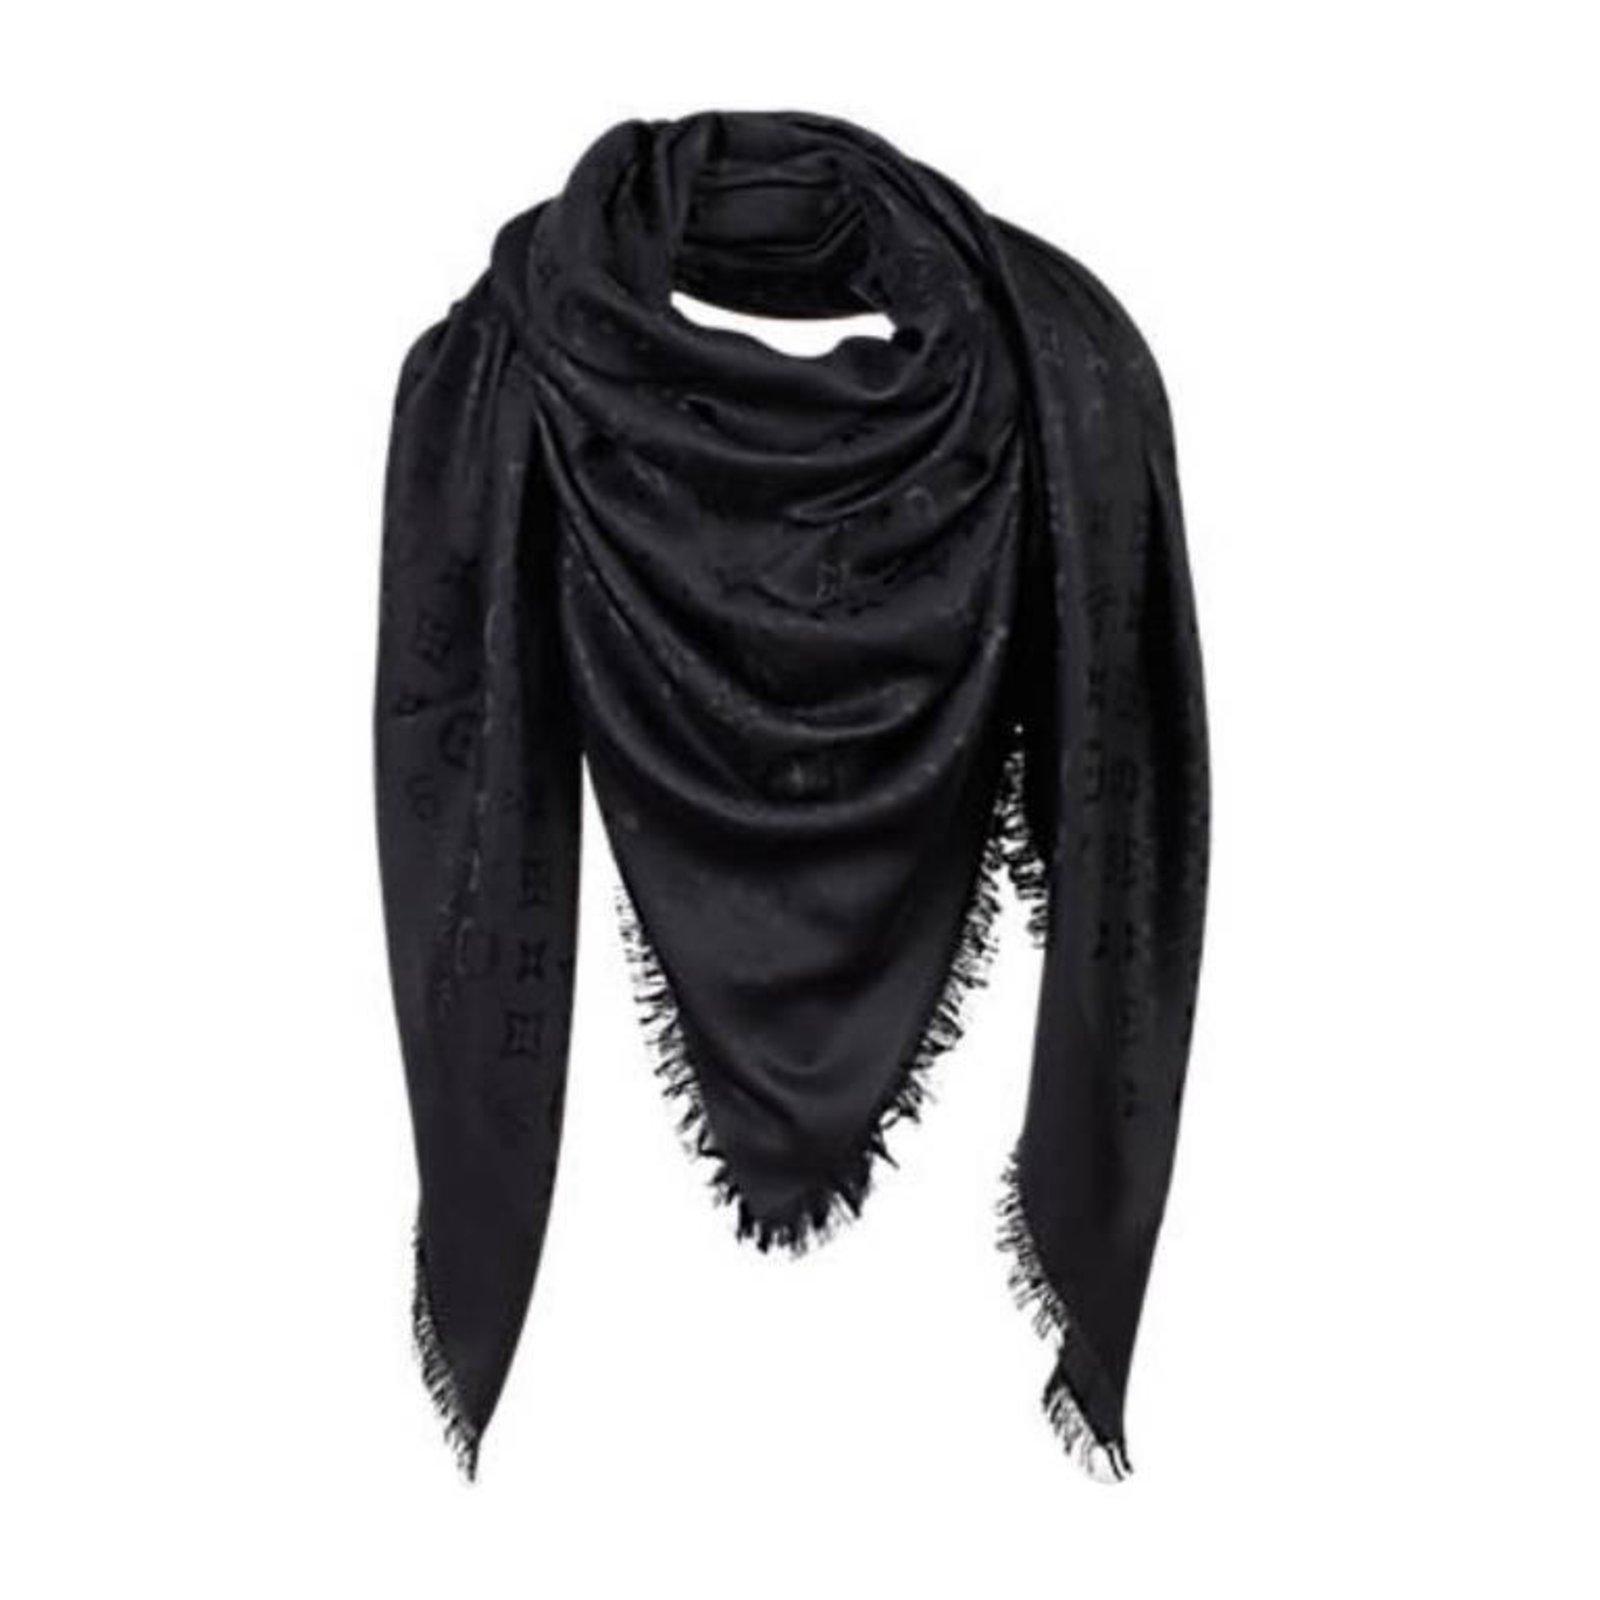 Foulards Louis Vuitton Foulard Monogramme Soie Noir ref.57900 - Joli ... 294aee7e248